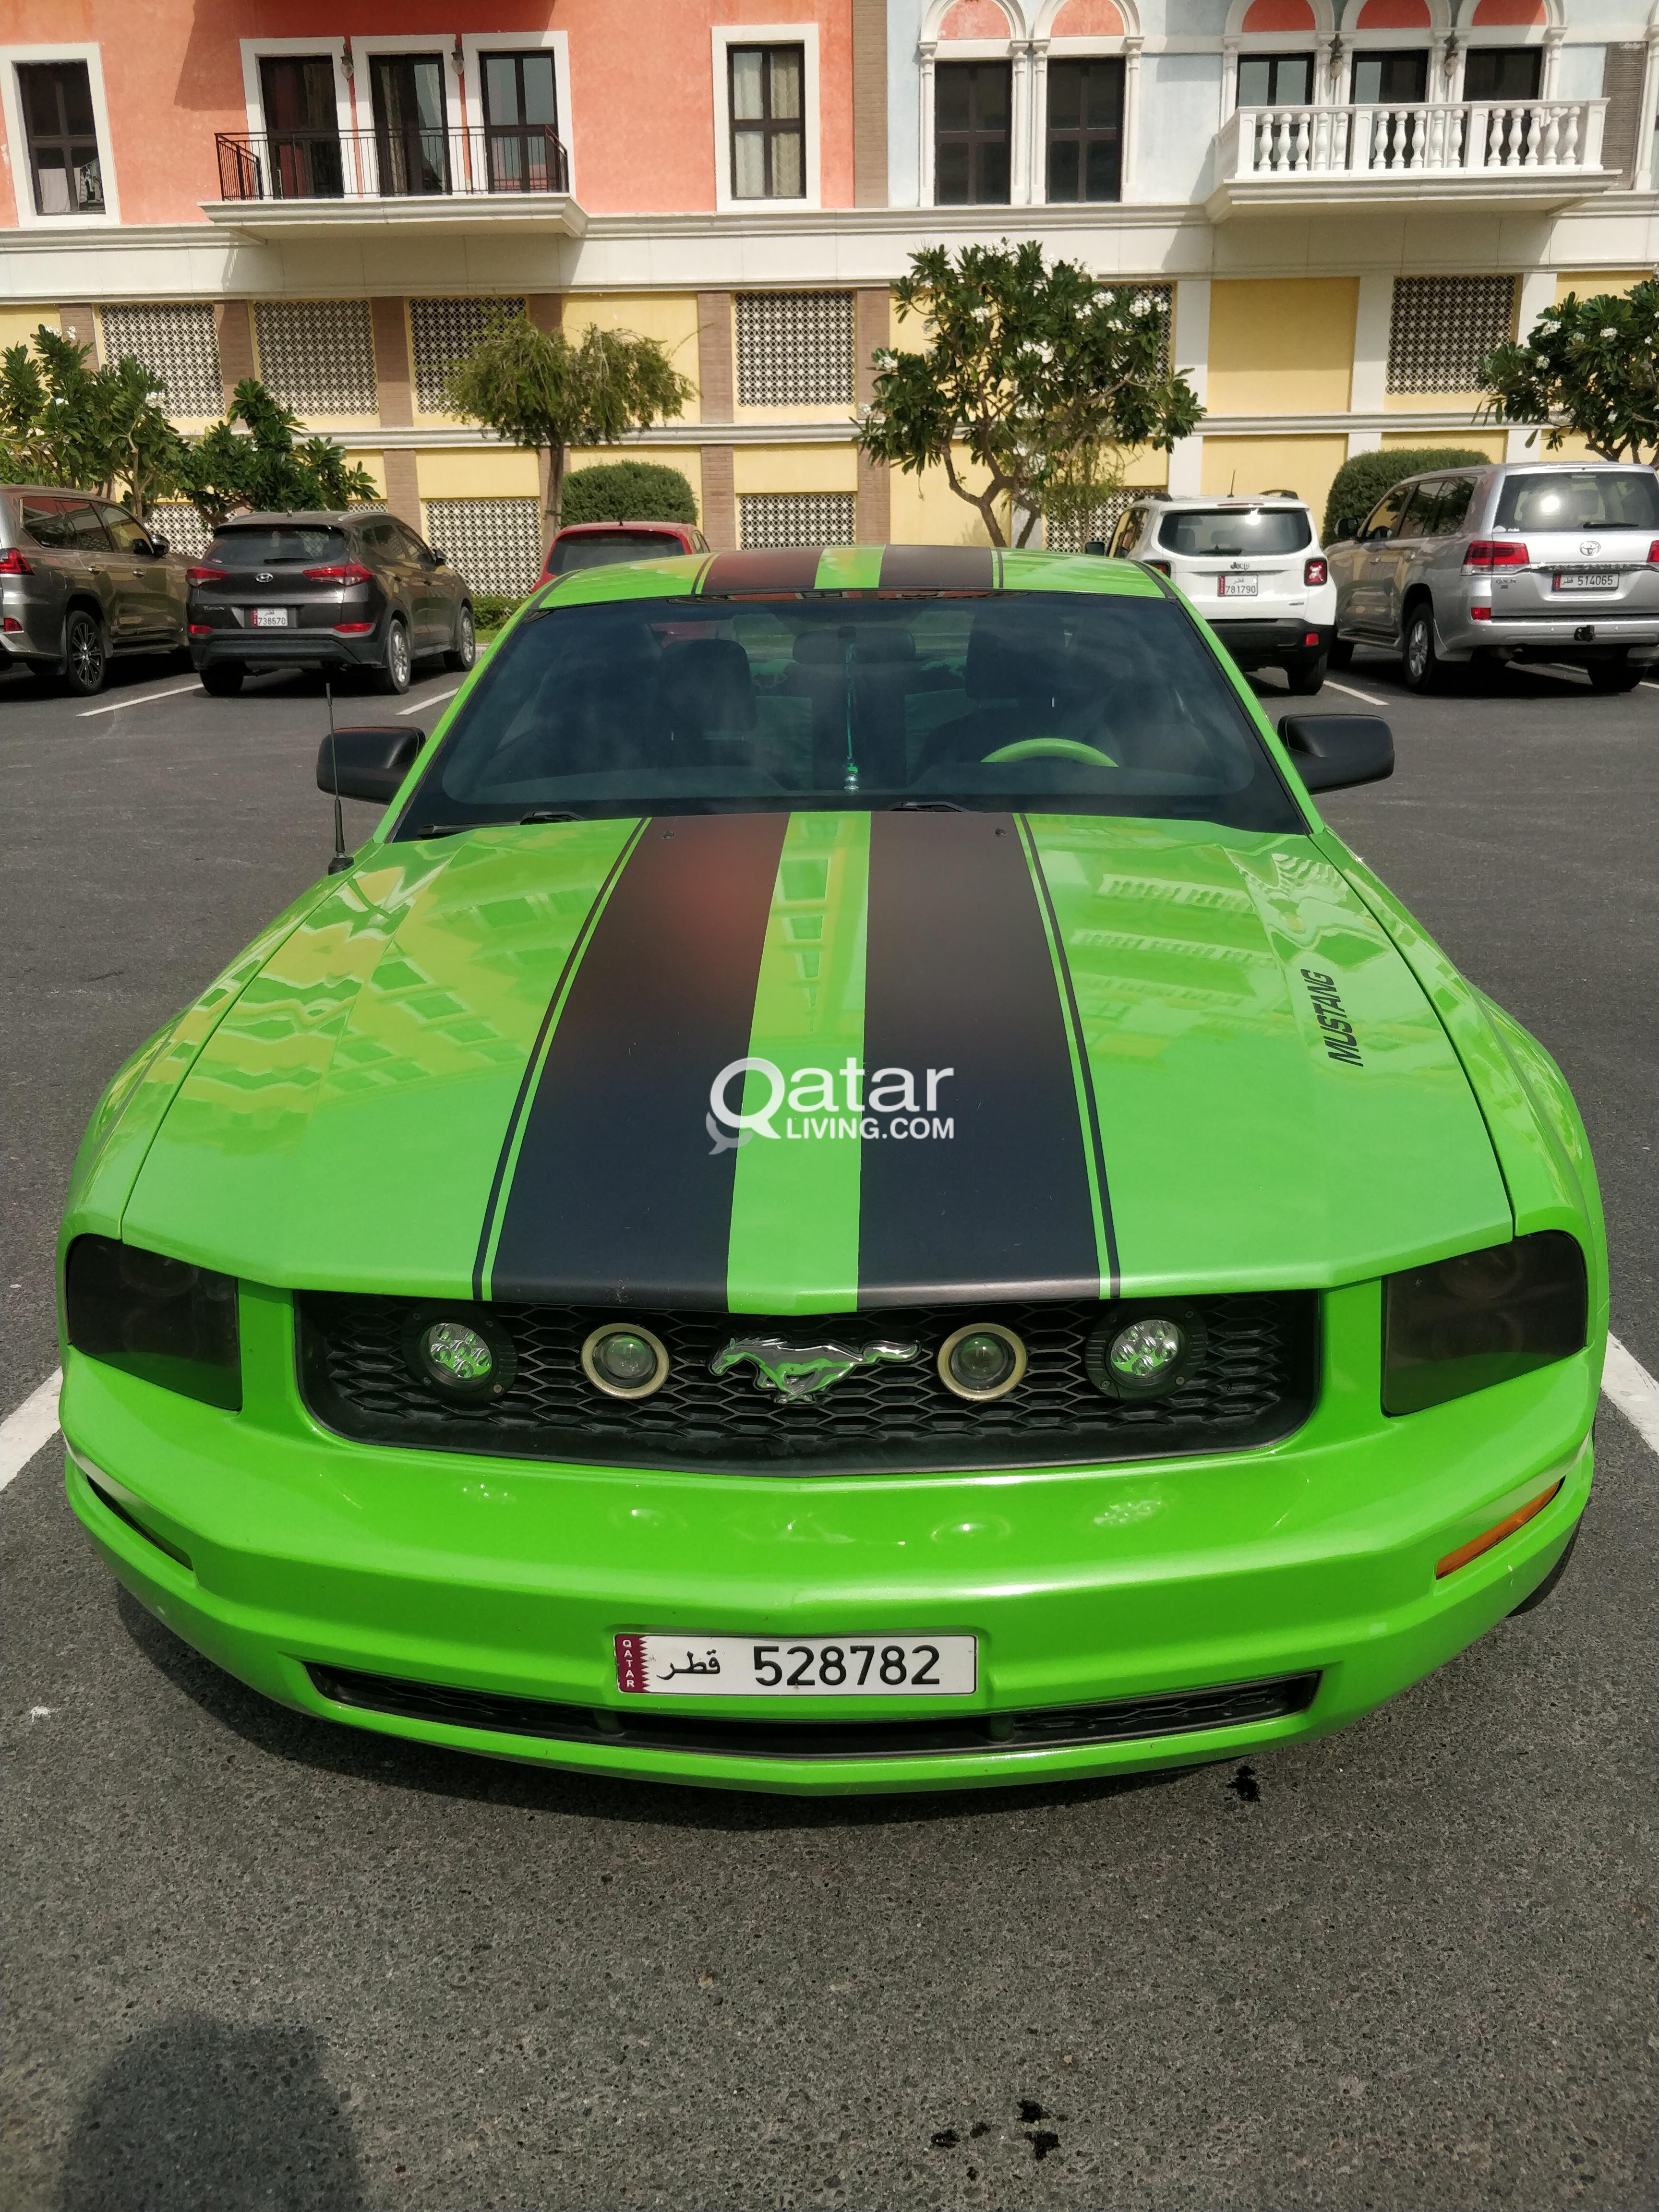 Mustang 2007 v6 automatic qatar living